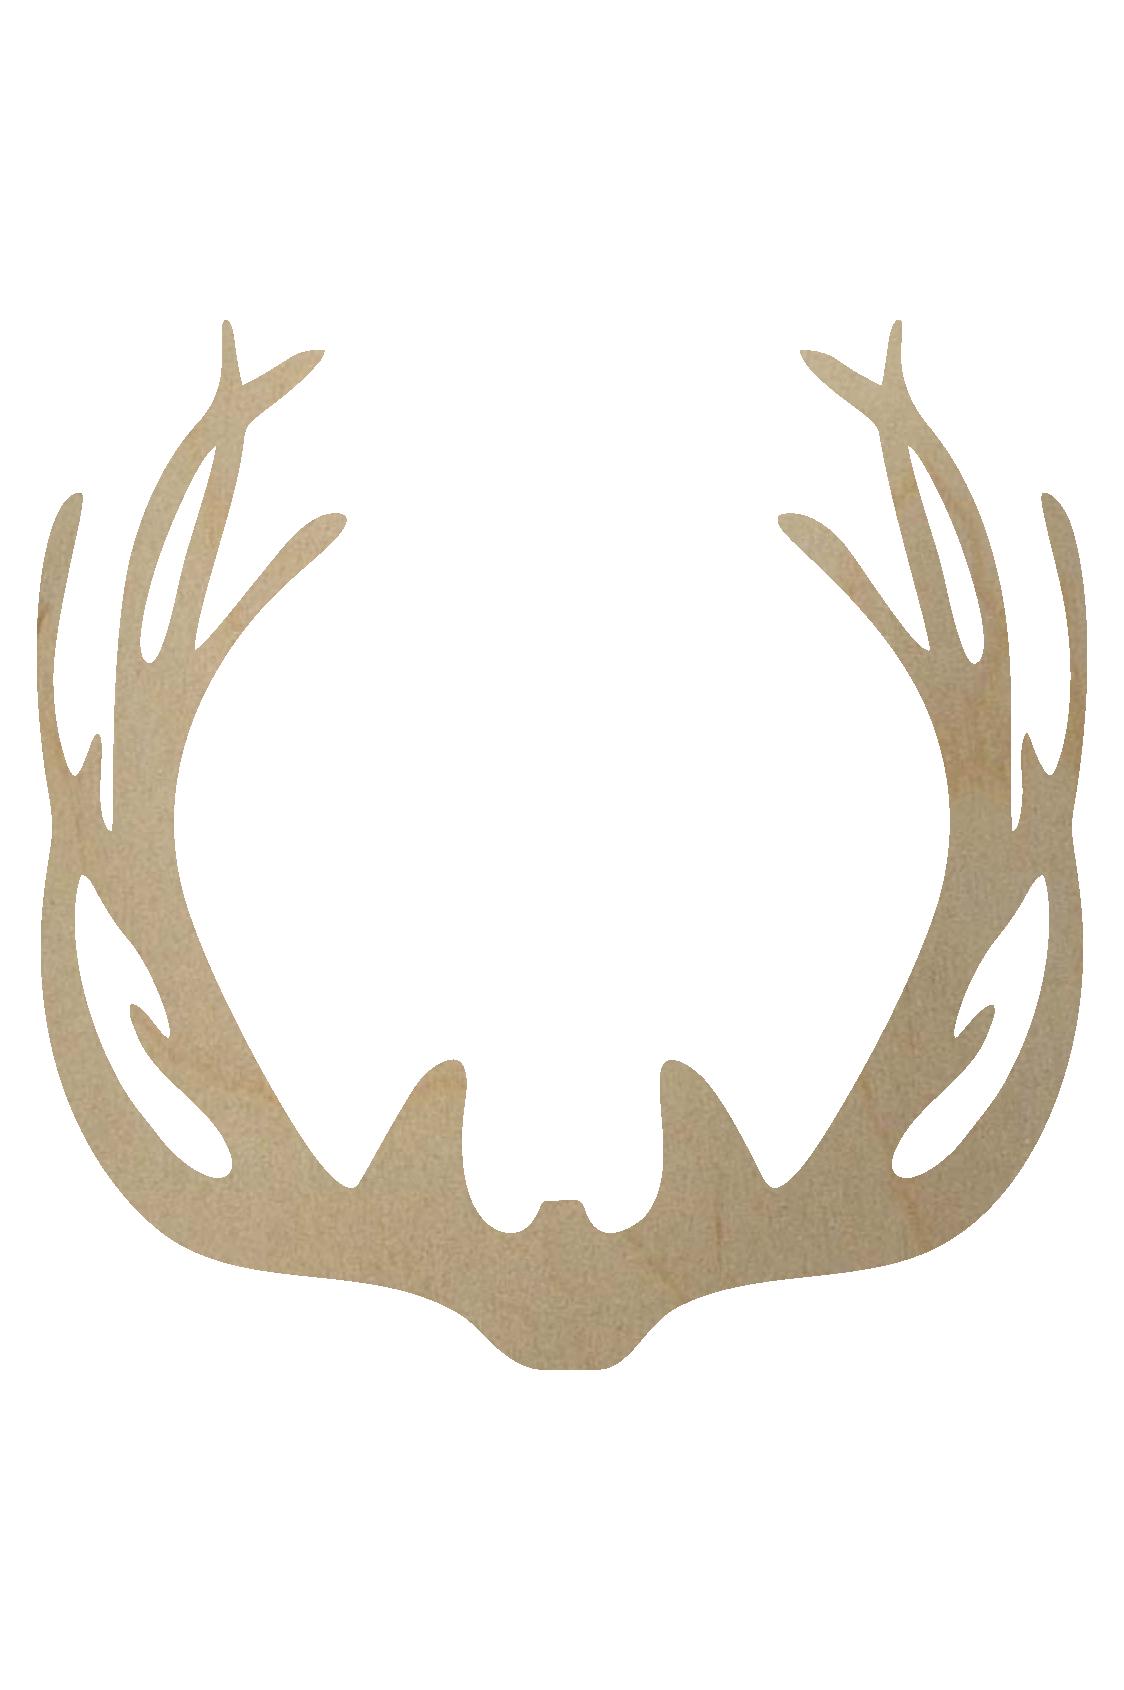 banner library library Wooden Deer Antler Shape